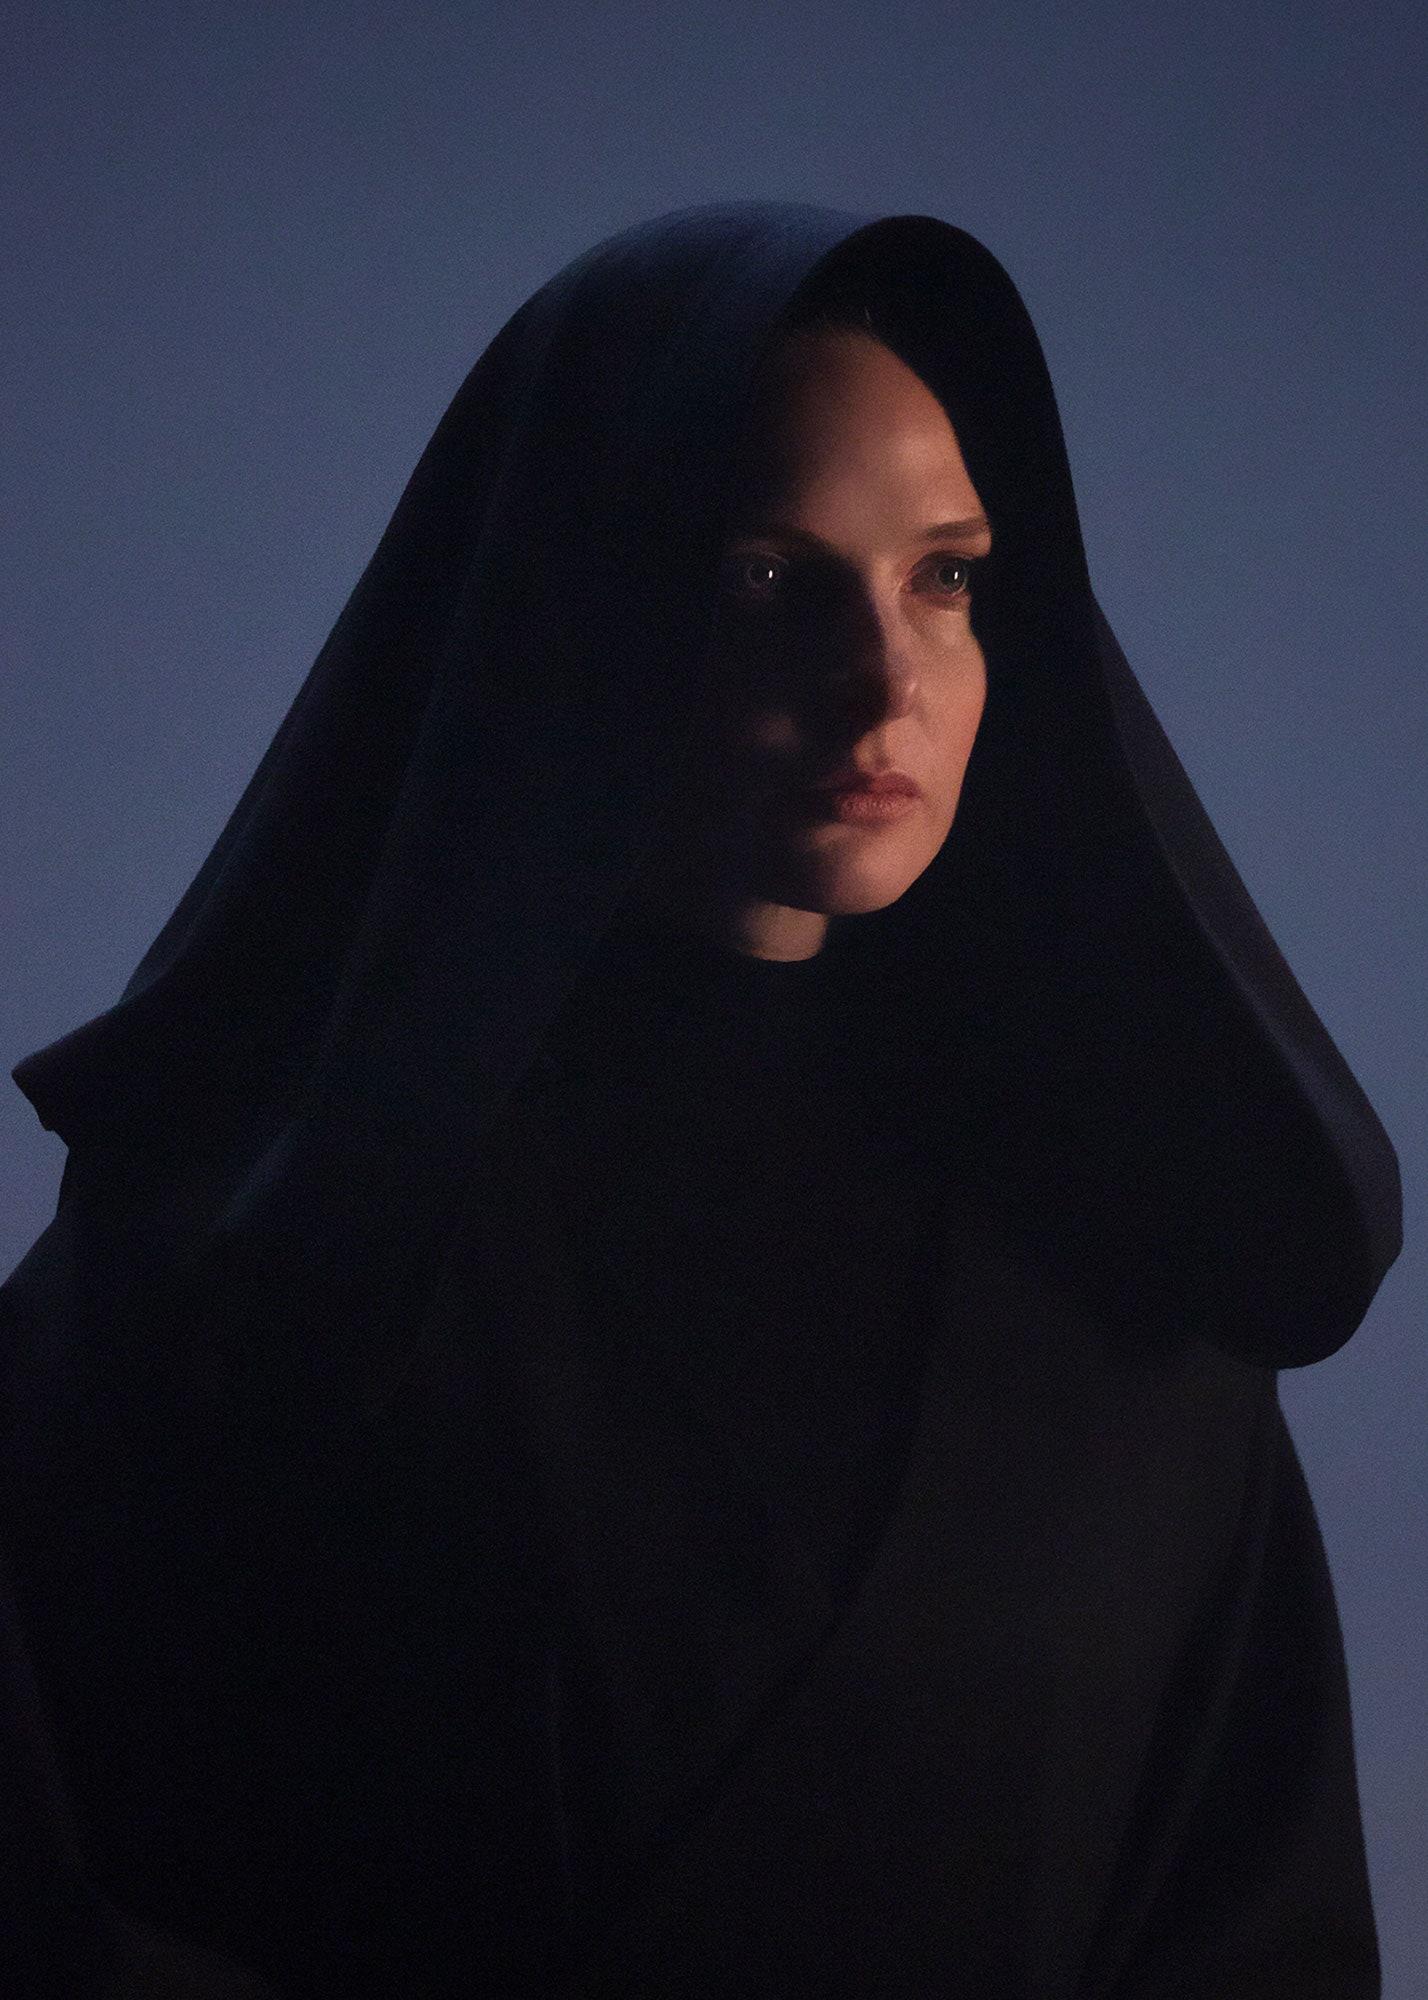 Rebecca Ferguson como Lady Jessica. Fotografía: Chiabella James